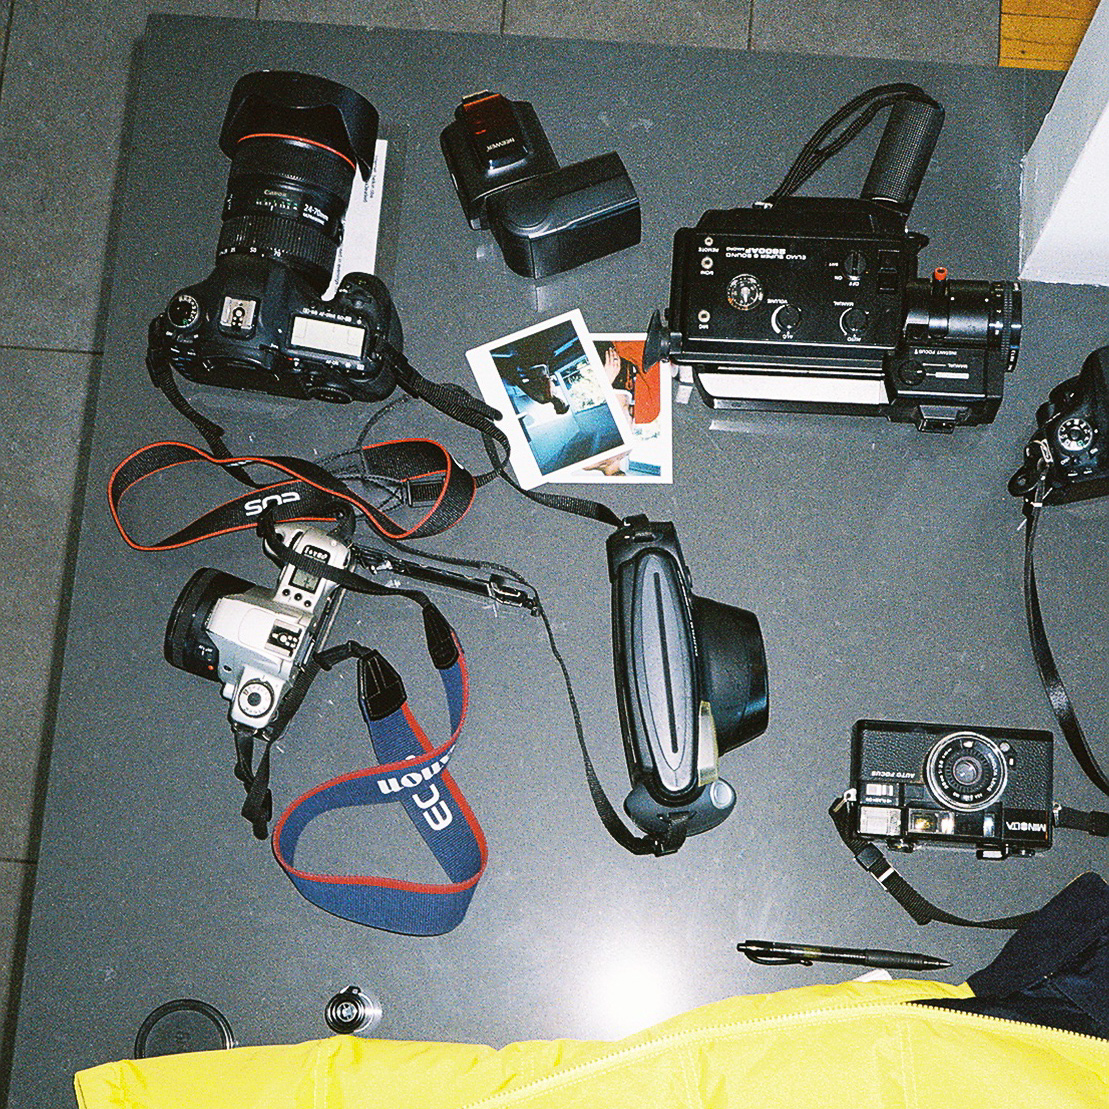 captainbarto-blog-adambartoshesky-model-viviankim-photo-nautica-client-theend-4.jpg